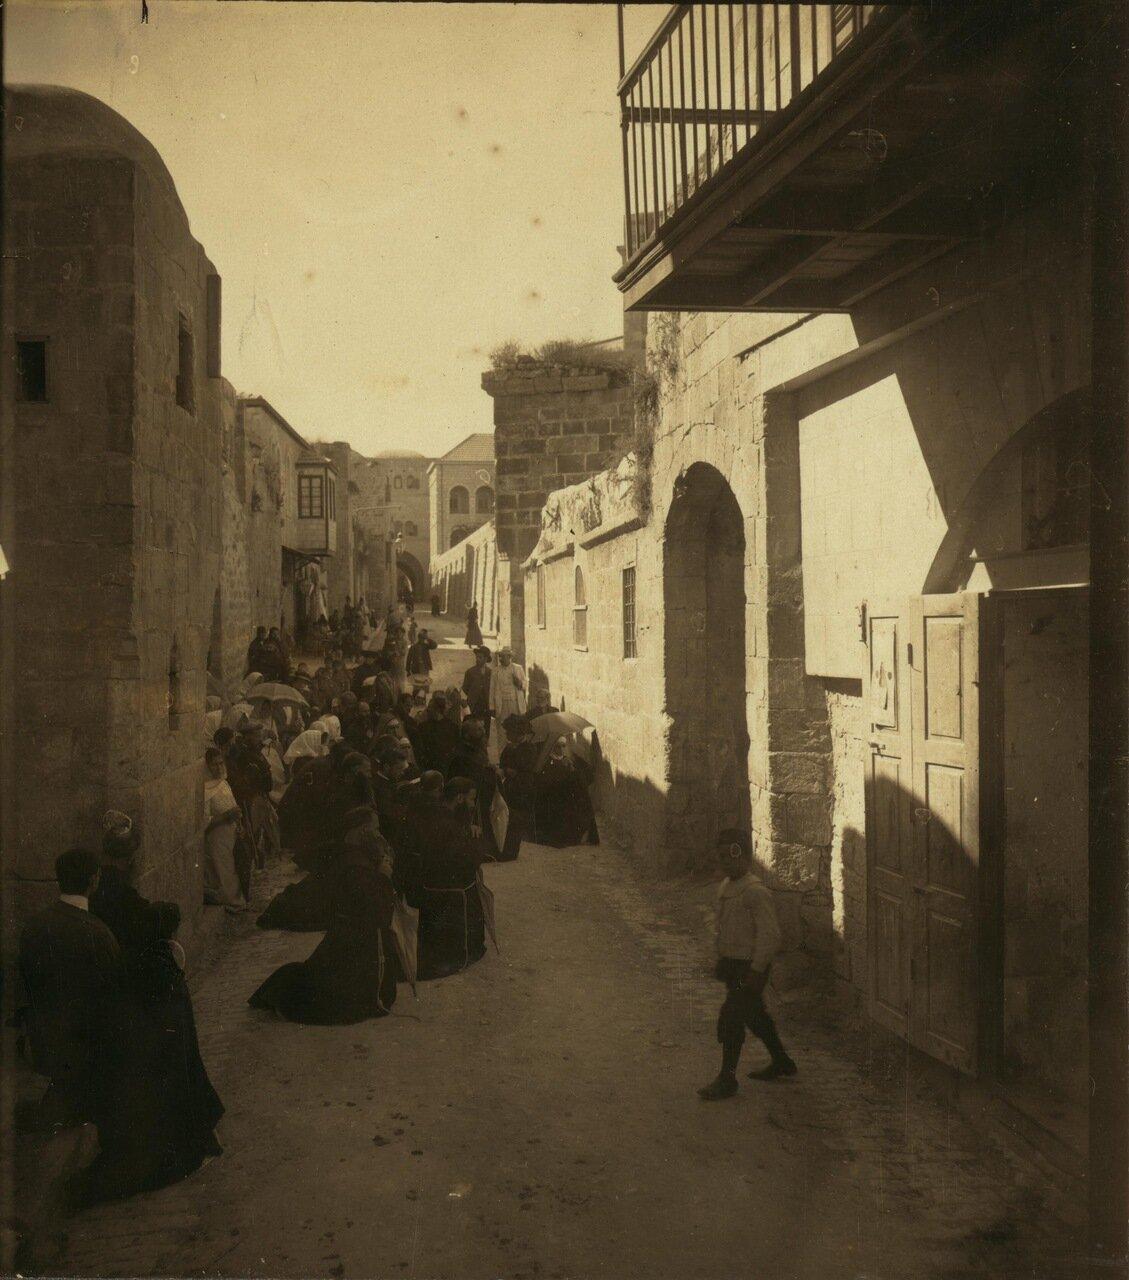 Четвертая остановка на Виа Долороза, место встречи Христа с Матерью по пути на Голгофу, 30 января 1913 г.